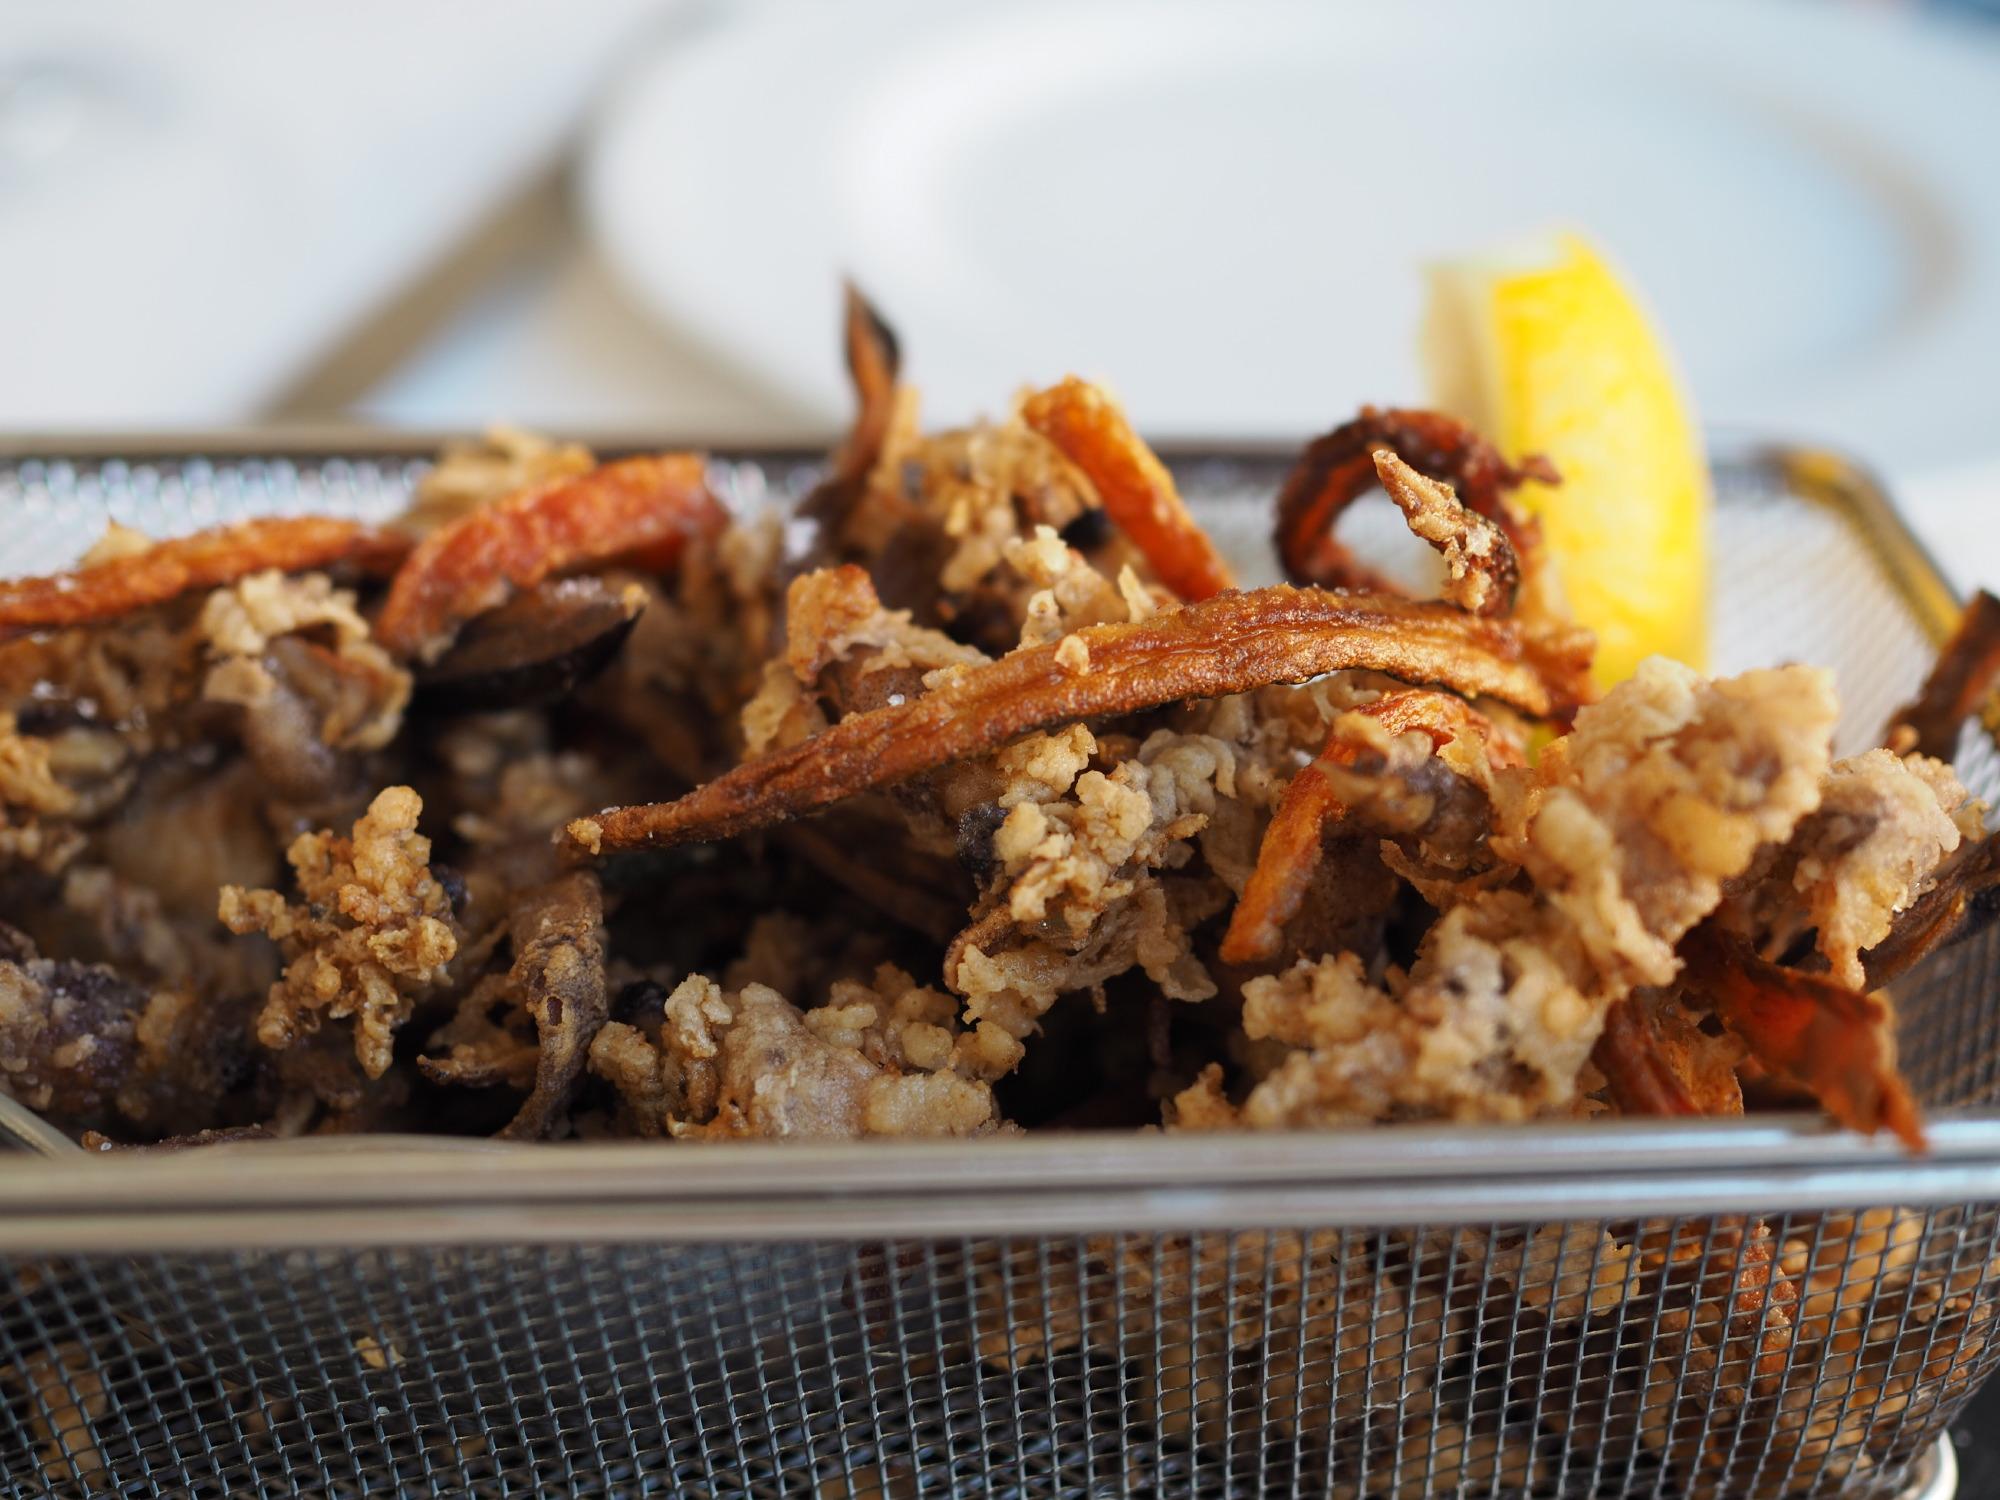 Calamari fritti@Cavallino Rosso